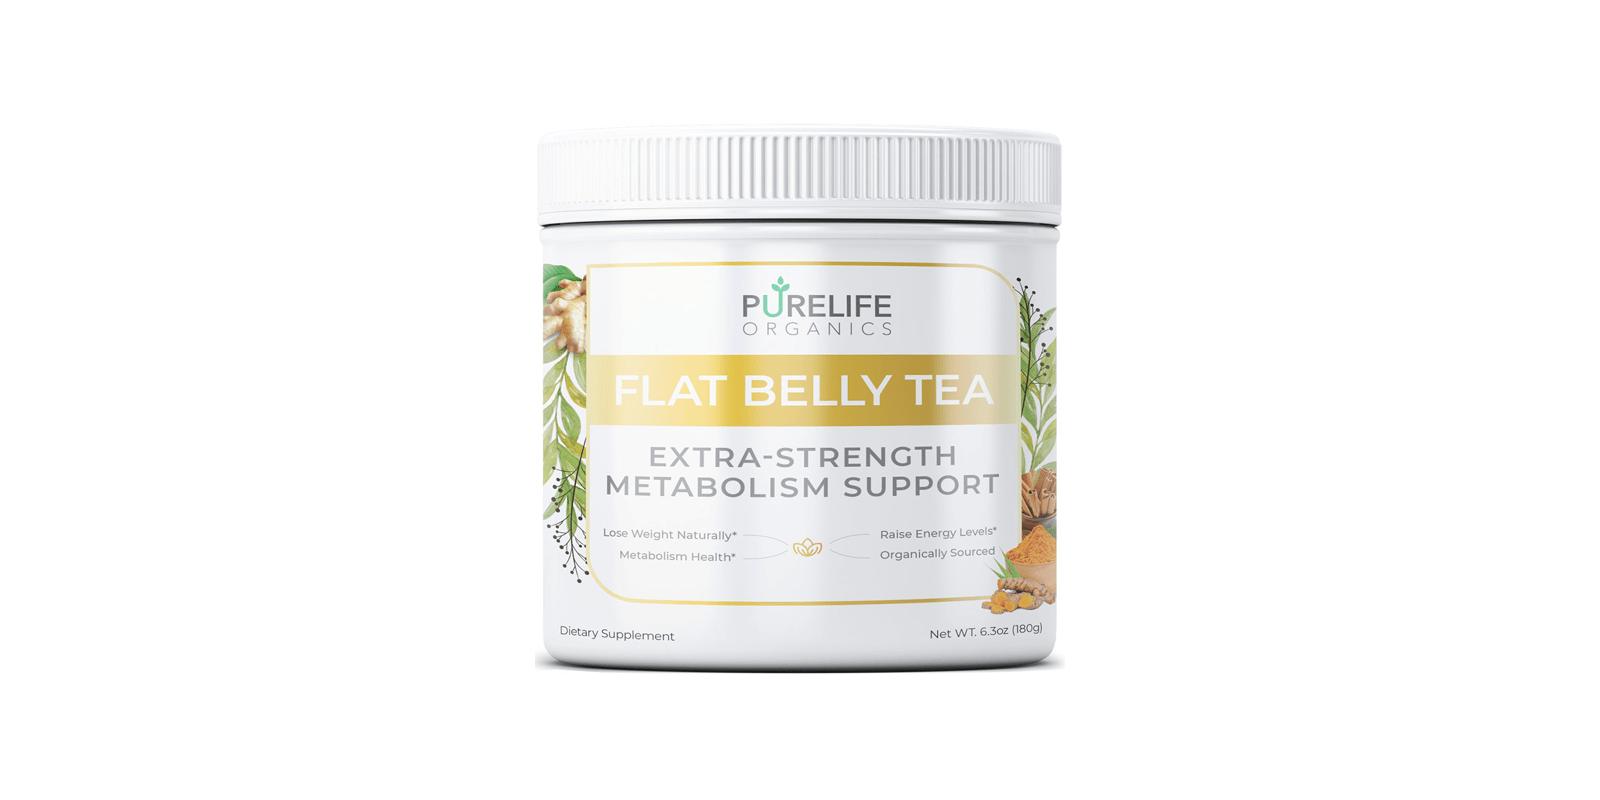 purelife organic flat belly tea review